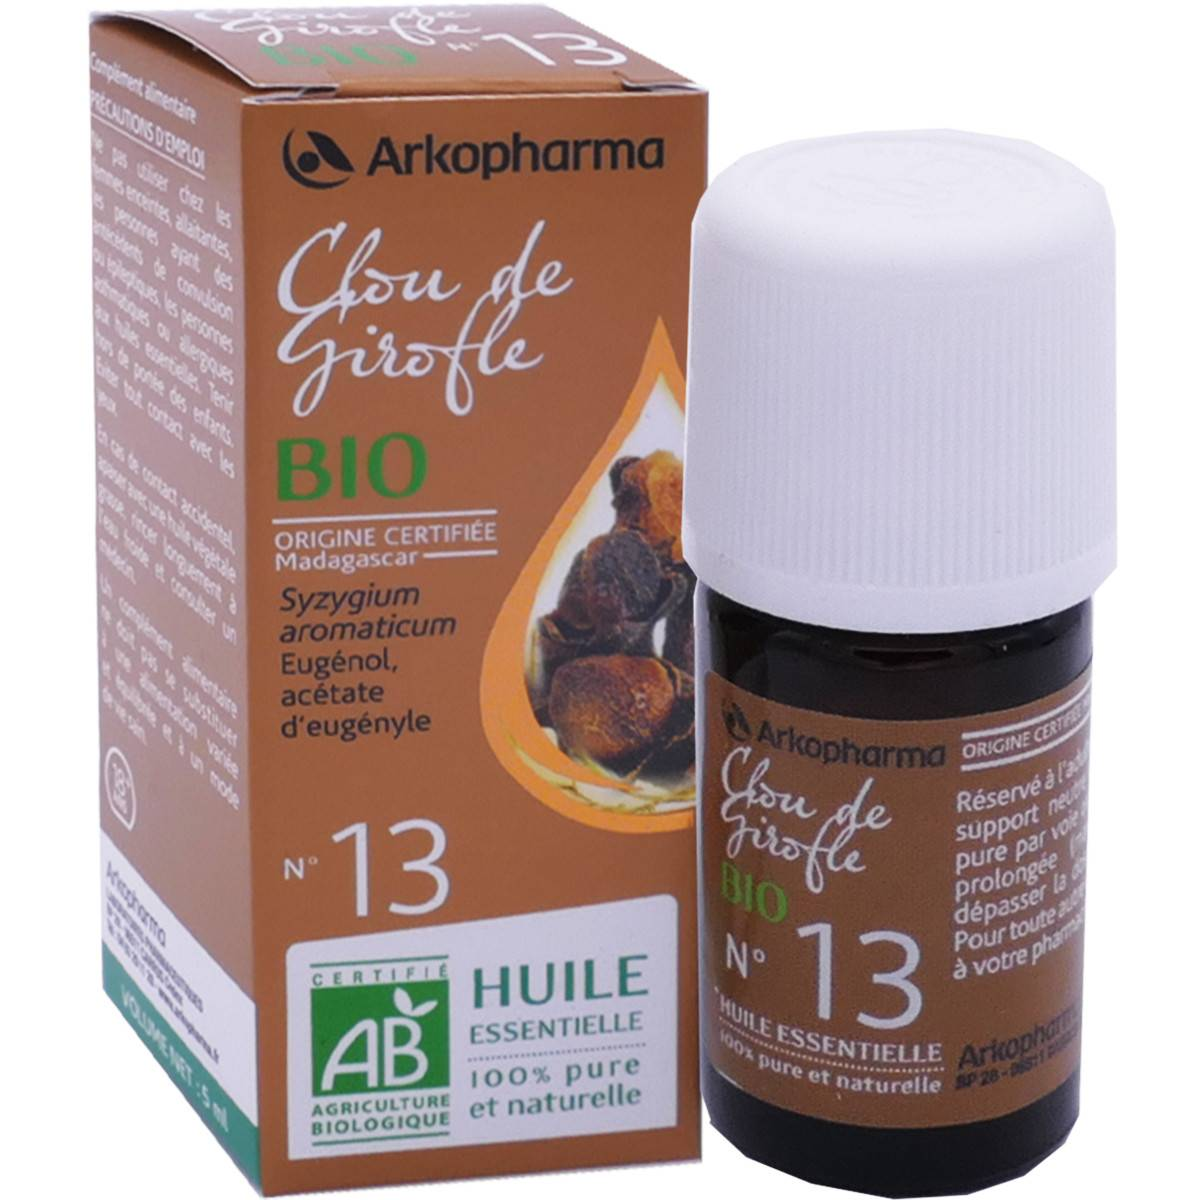 Arkopharma clou de girofle bio n°13 5 ml